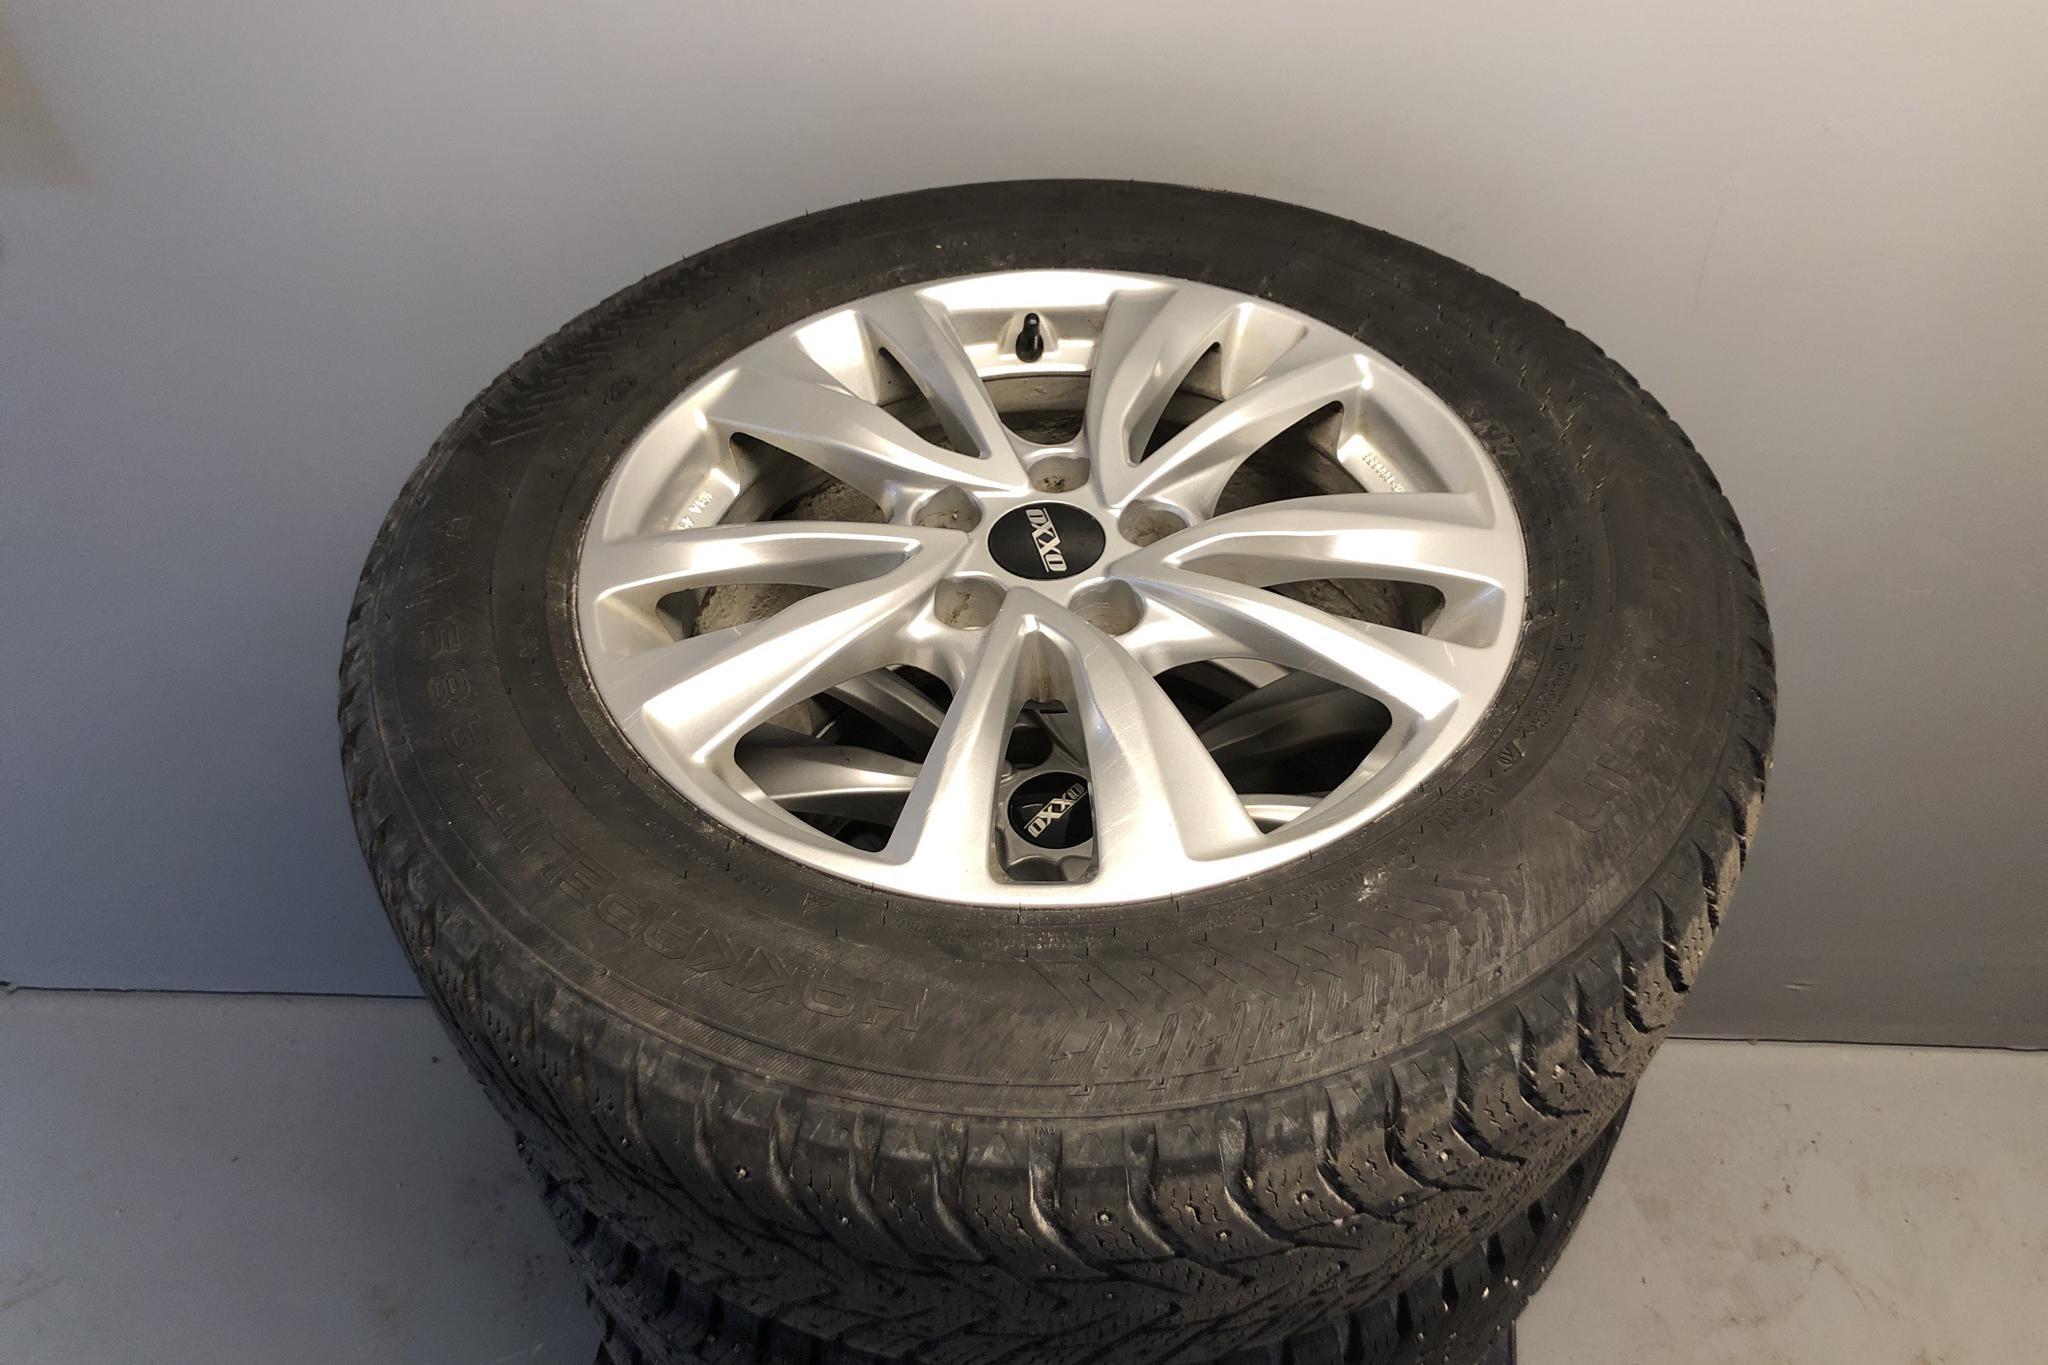 Toyota RAV4 2.0 VVT-i AWD (151hk) - 13 677 mil - Automat - vit - 2017